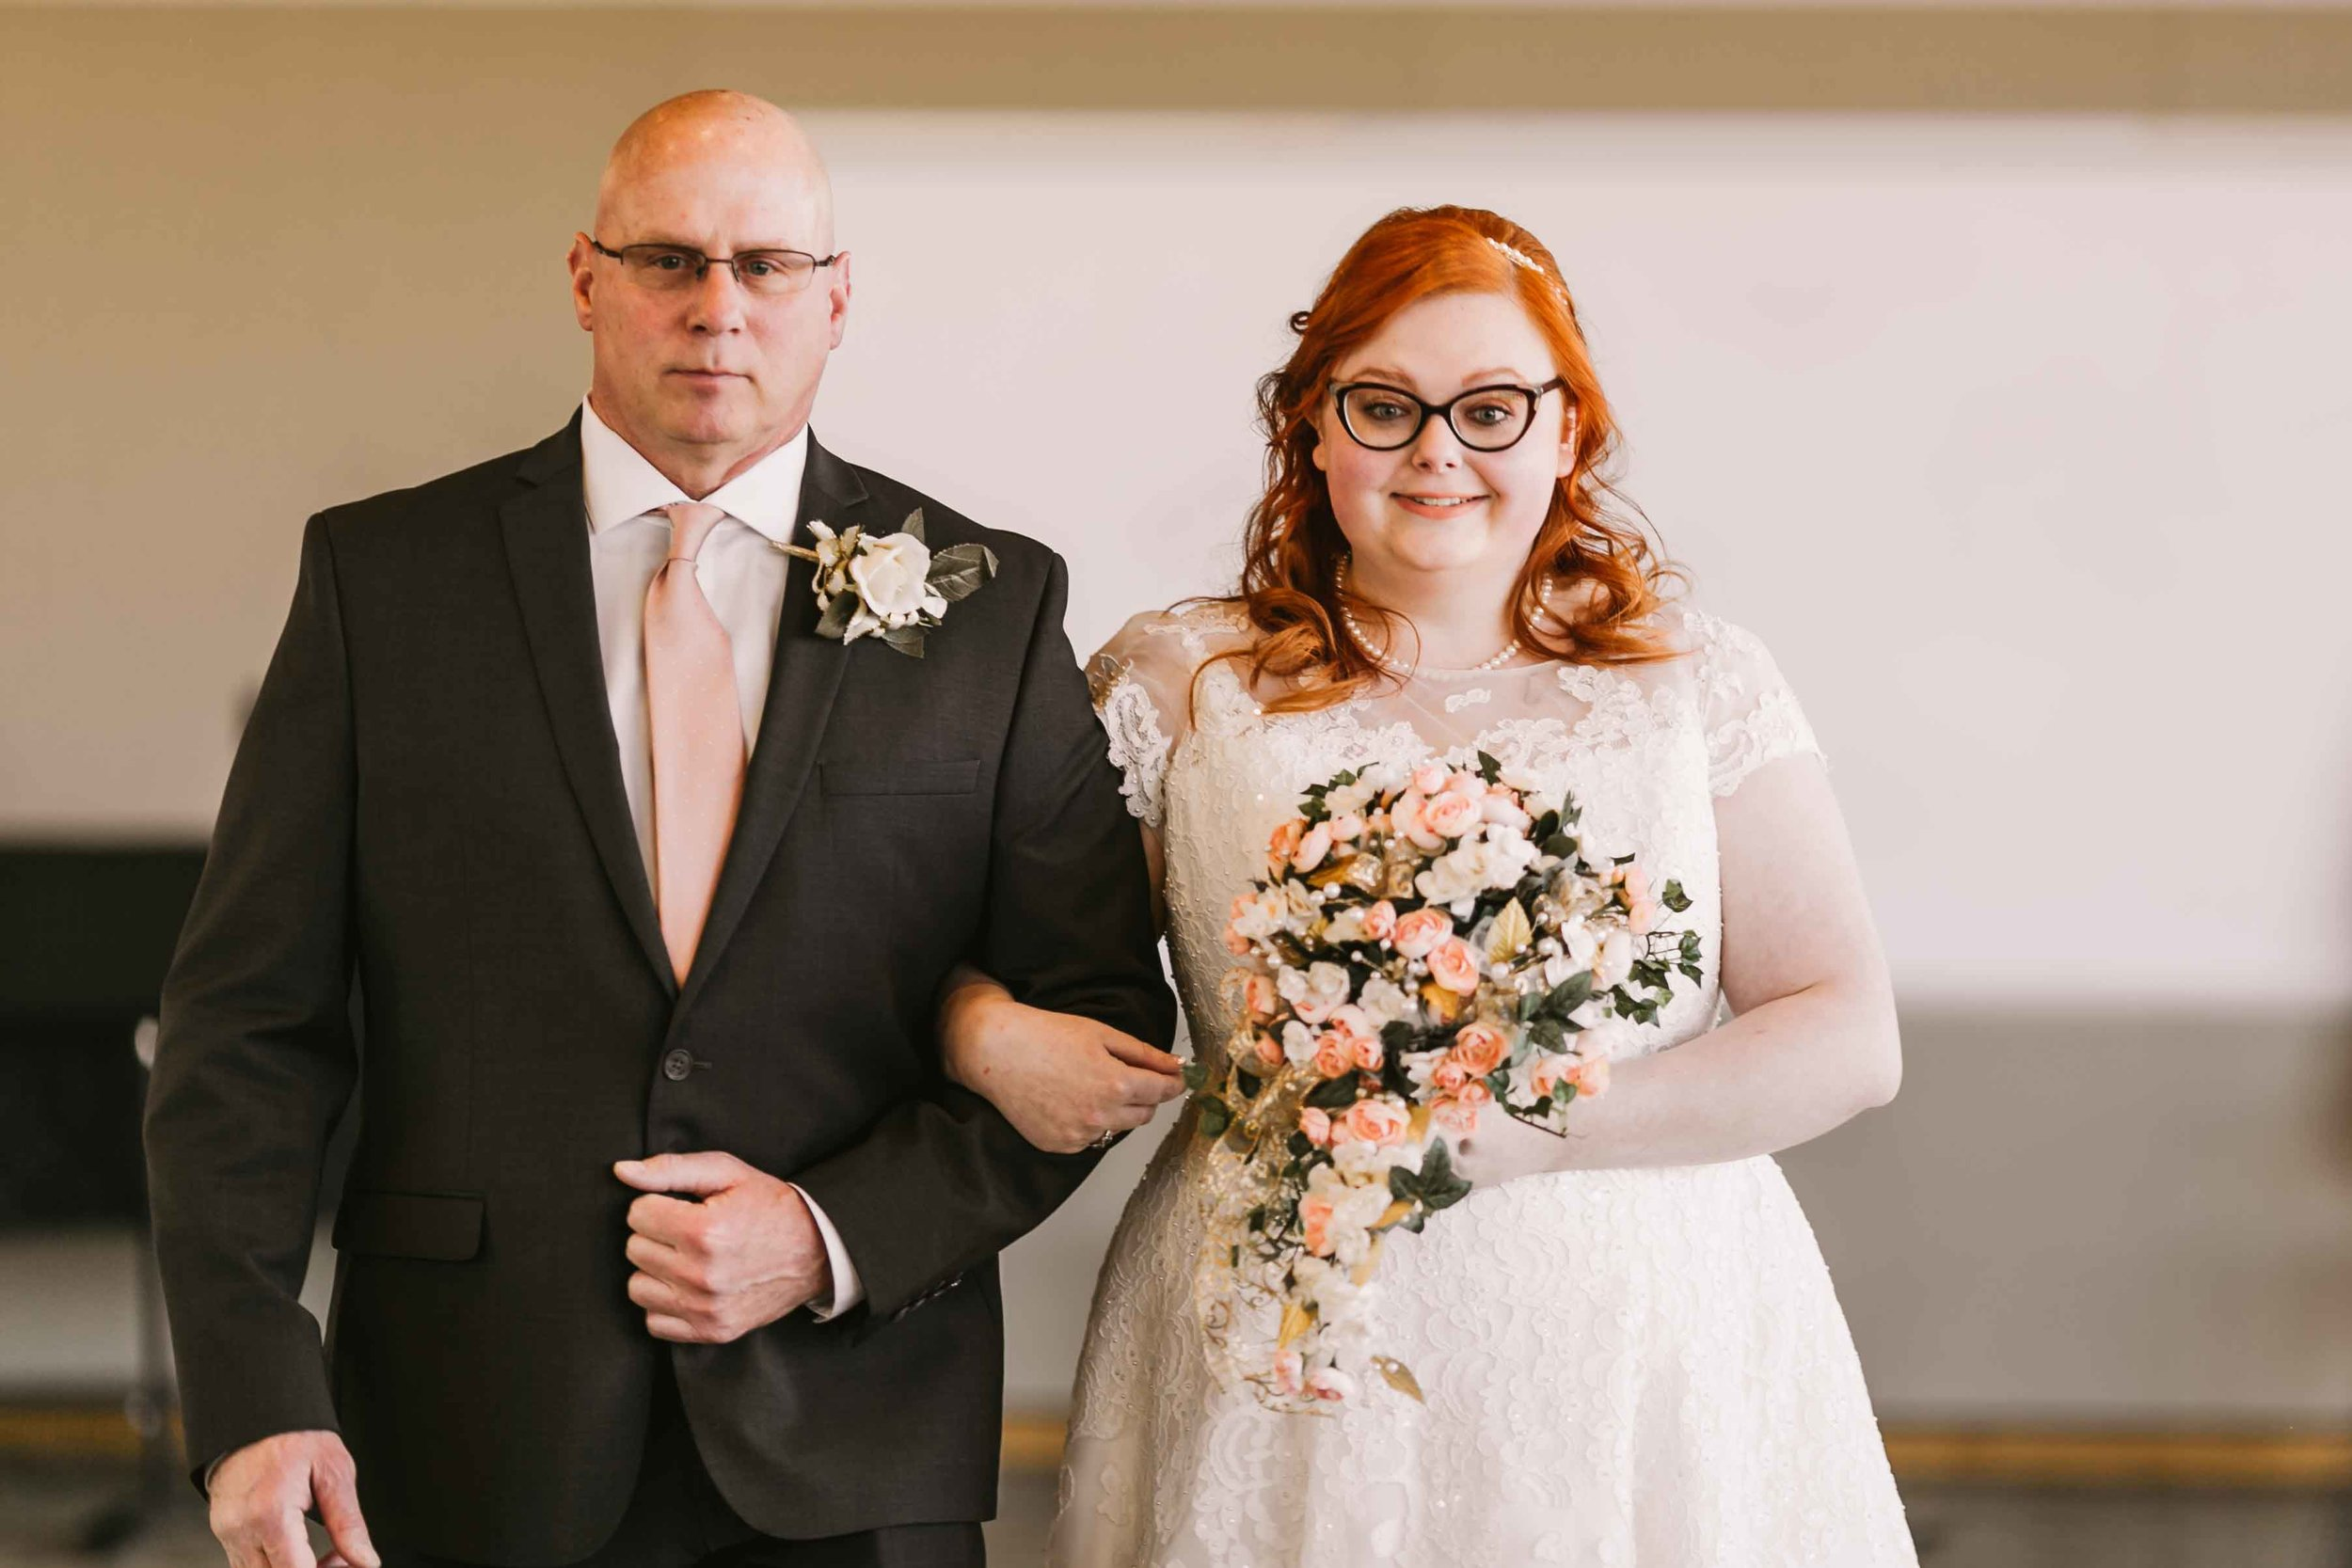 richland-wedding-photographer-26.jpg